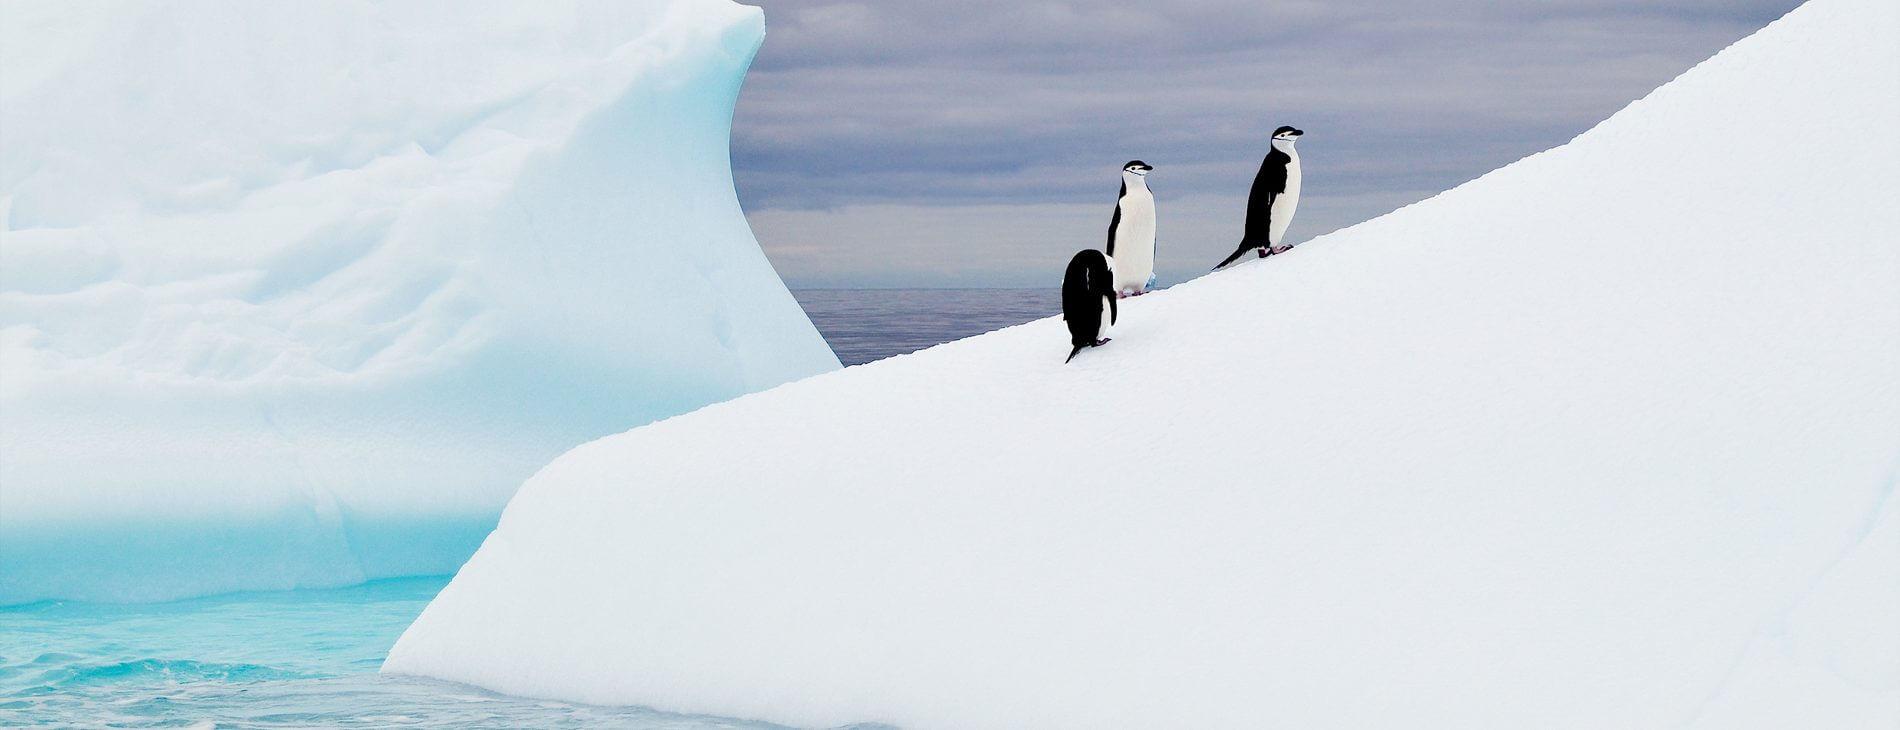 Mastroviaggiatore Antarctica iceberg